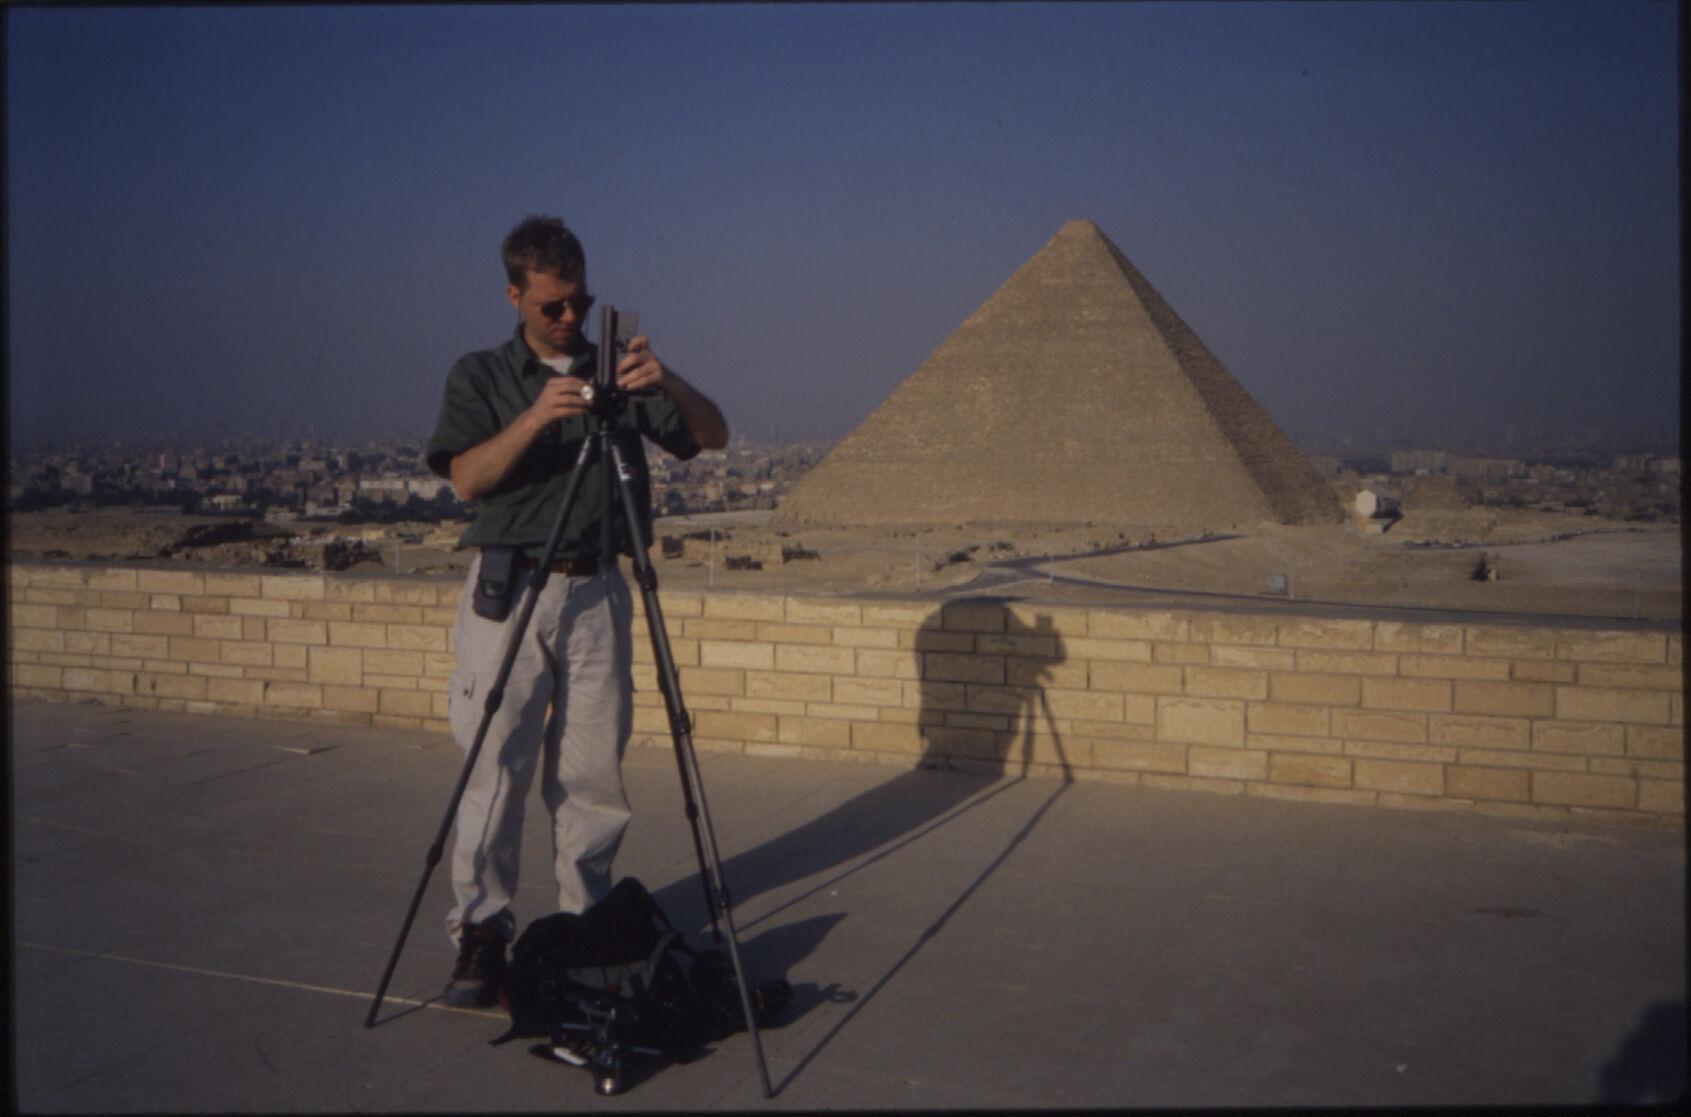 People & places: Site: Giza; View: Harvard Camp, Khufu pyramid